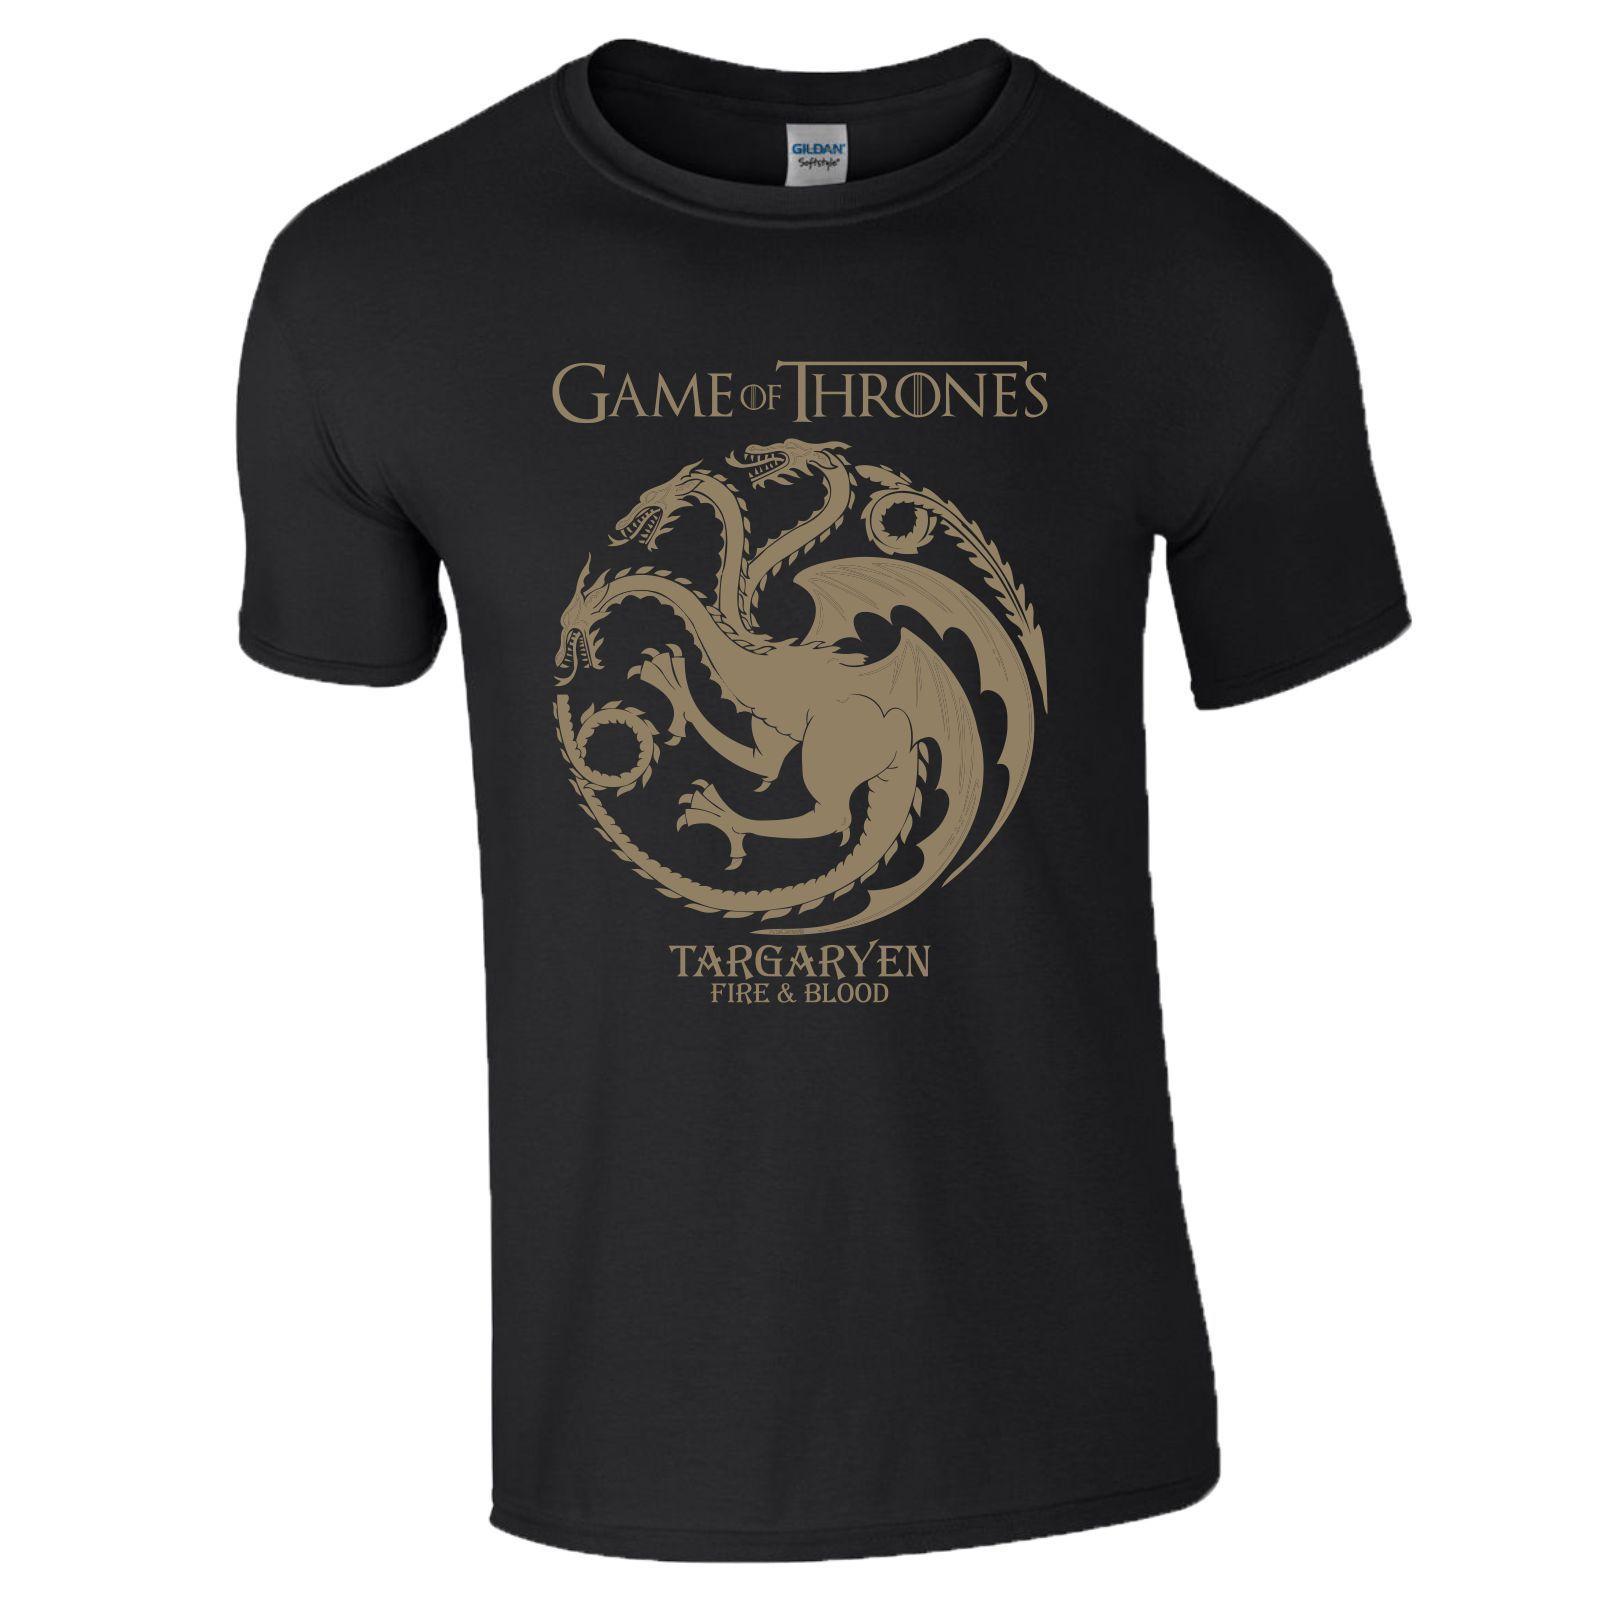 43107ac56 Game OF Thrones T Shirt TV Series Targaryen Khaleesi Fire Blood Gift Mens  Ladies Awesome Shirt Design Free T Shirts From Bstdhgate02, $11.01|  DHgate.Com